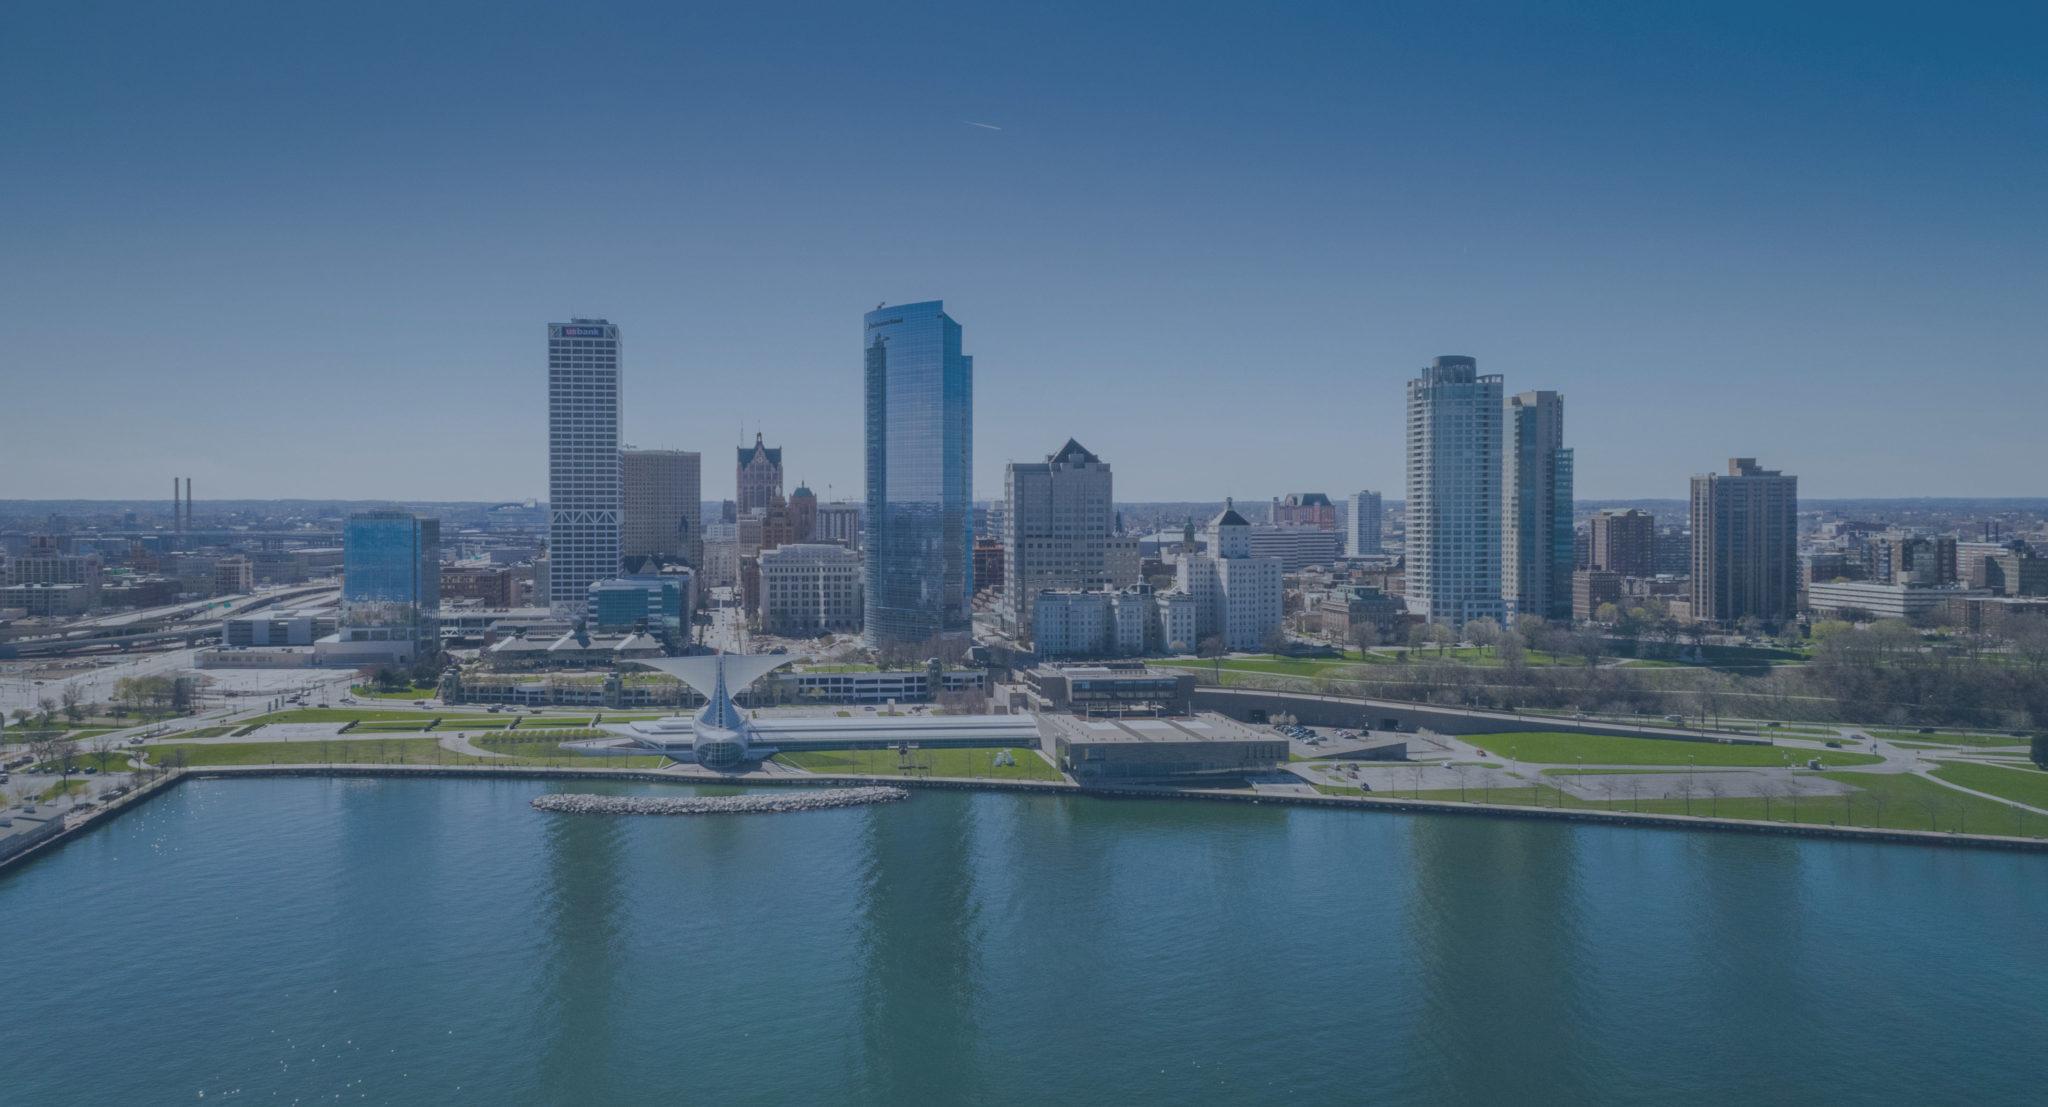 Milwaukee, Wisconsin - Corporate Headquarters